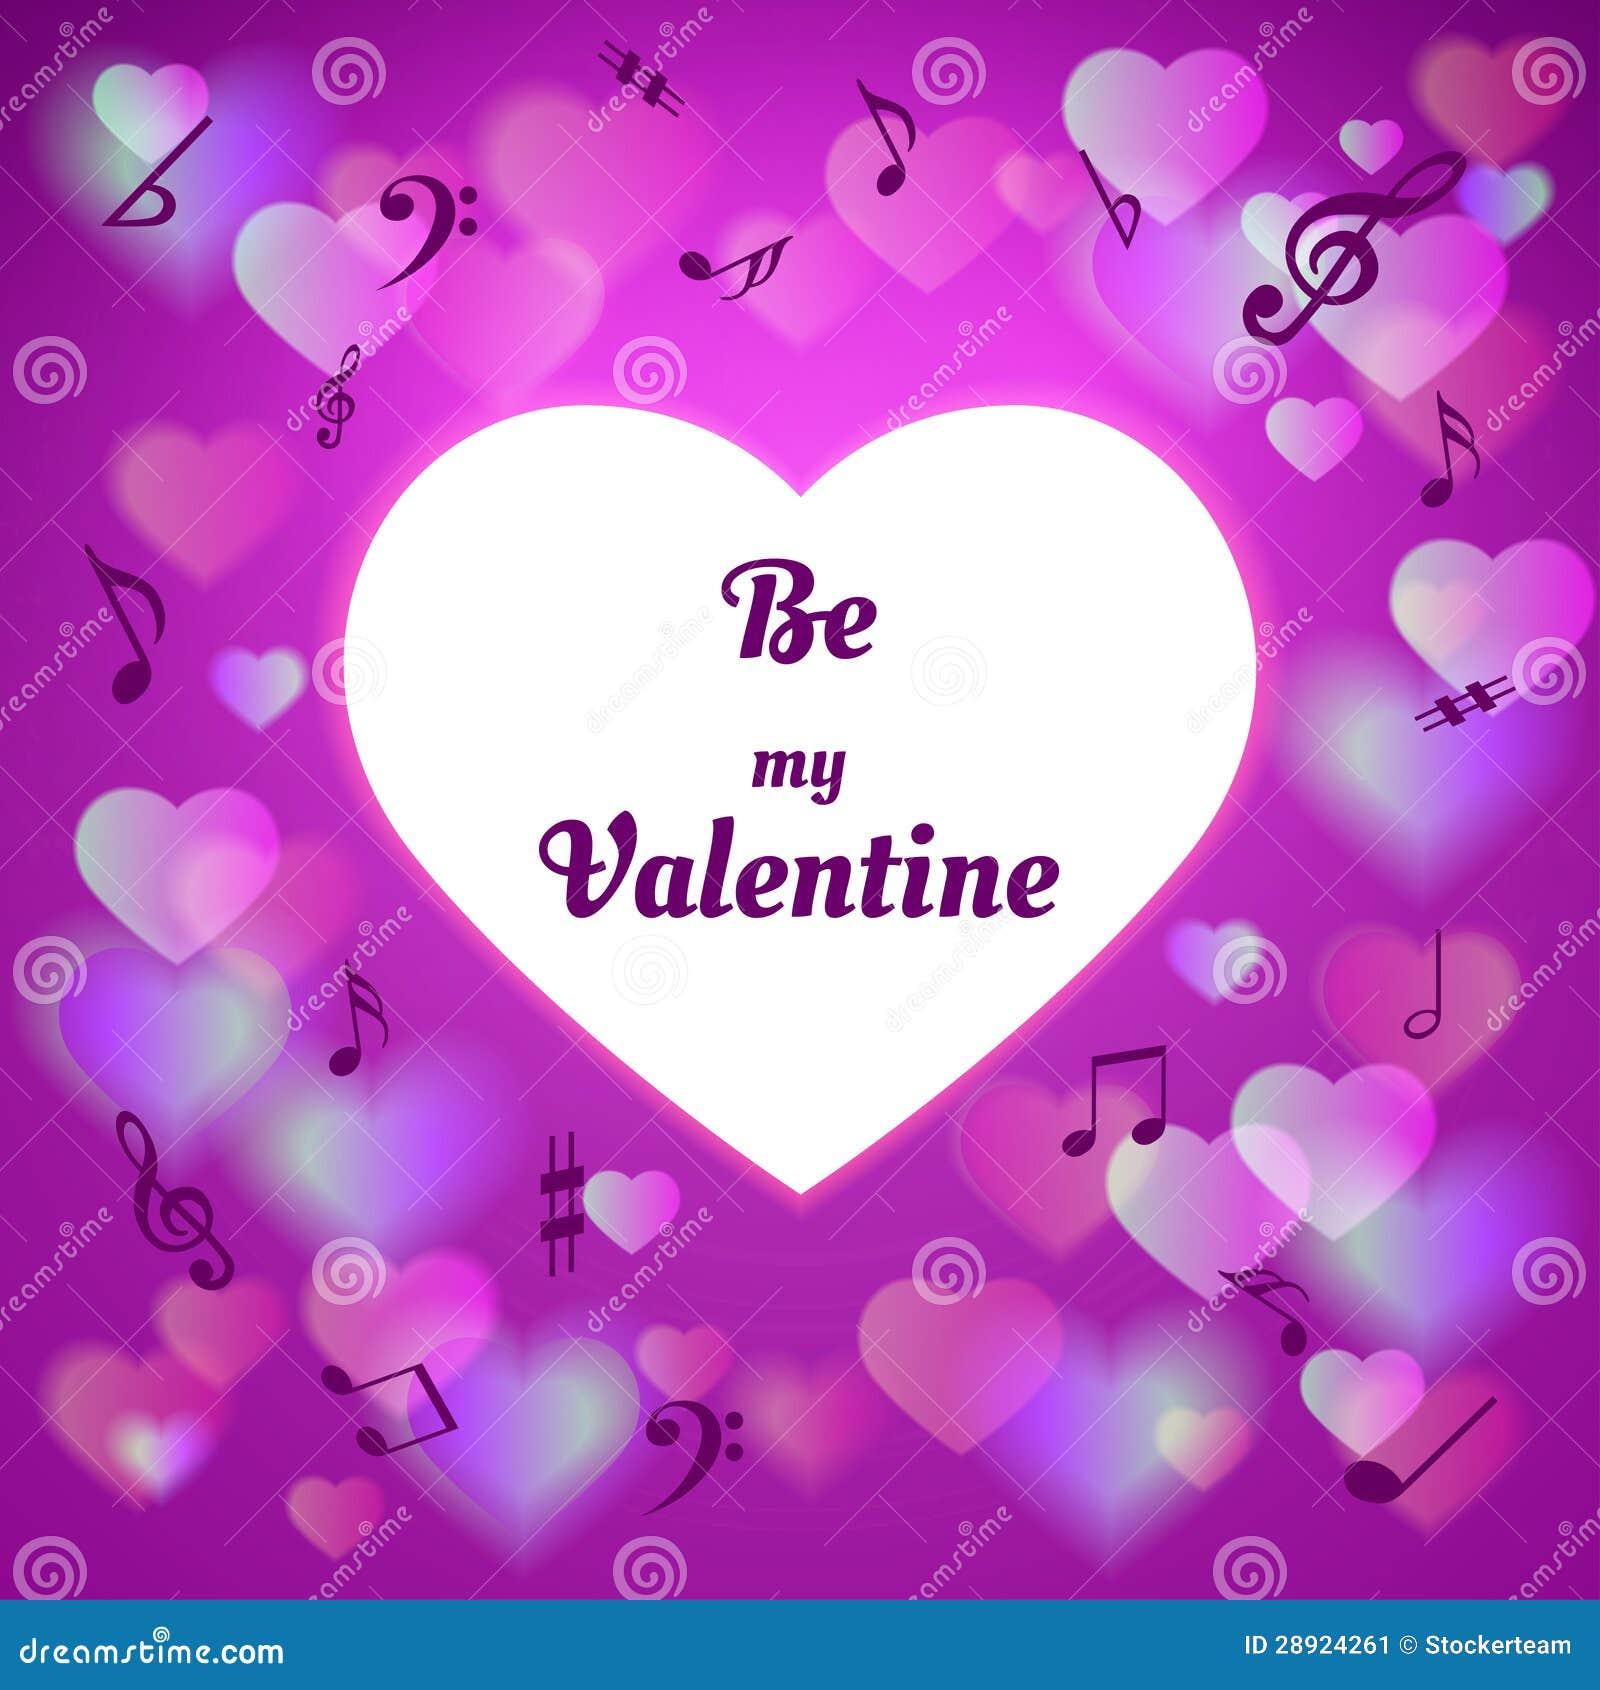 purple love valentine day - photo #12